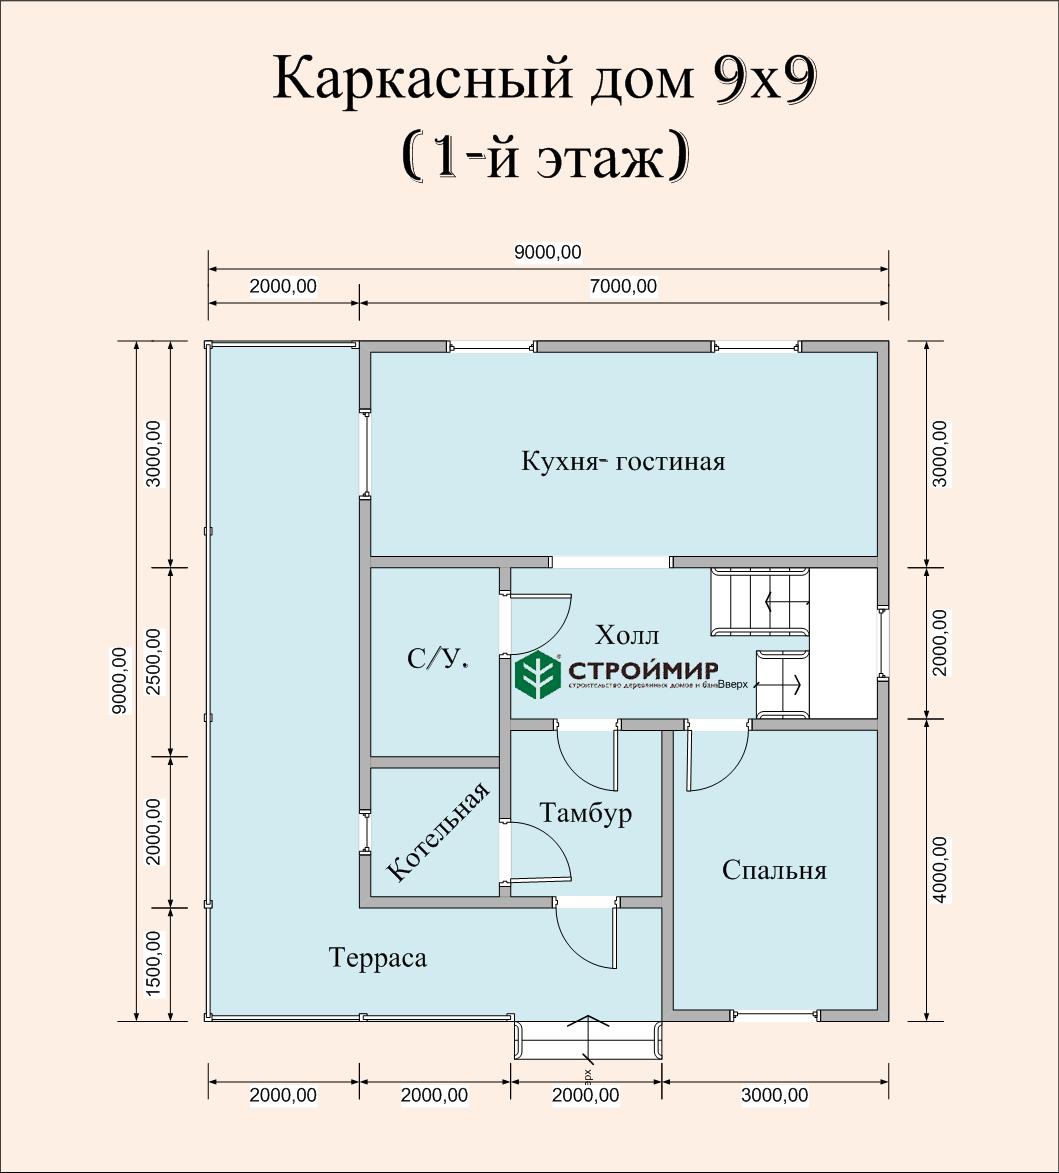 Каркасный дом 9х9, проект К-117